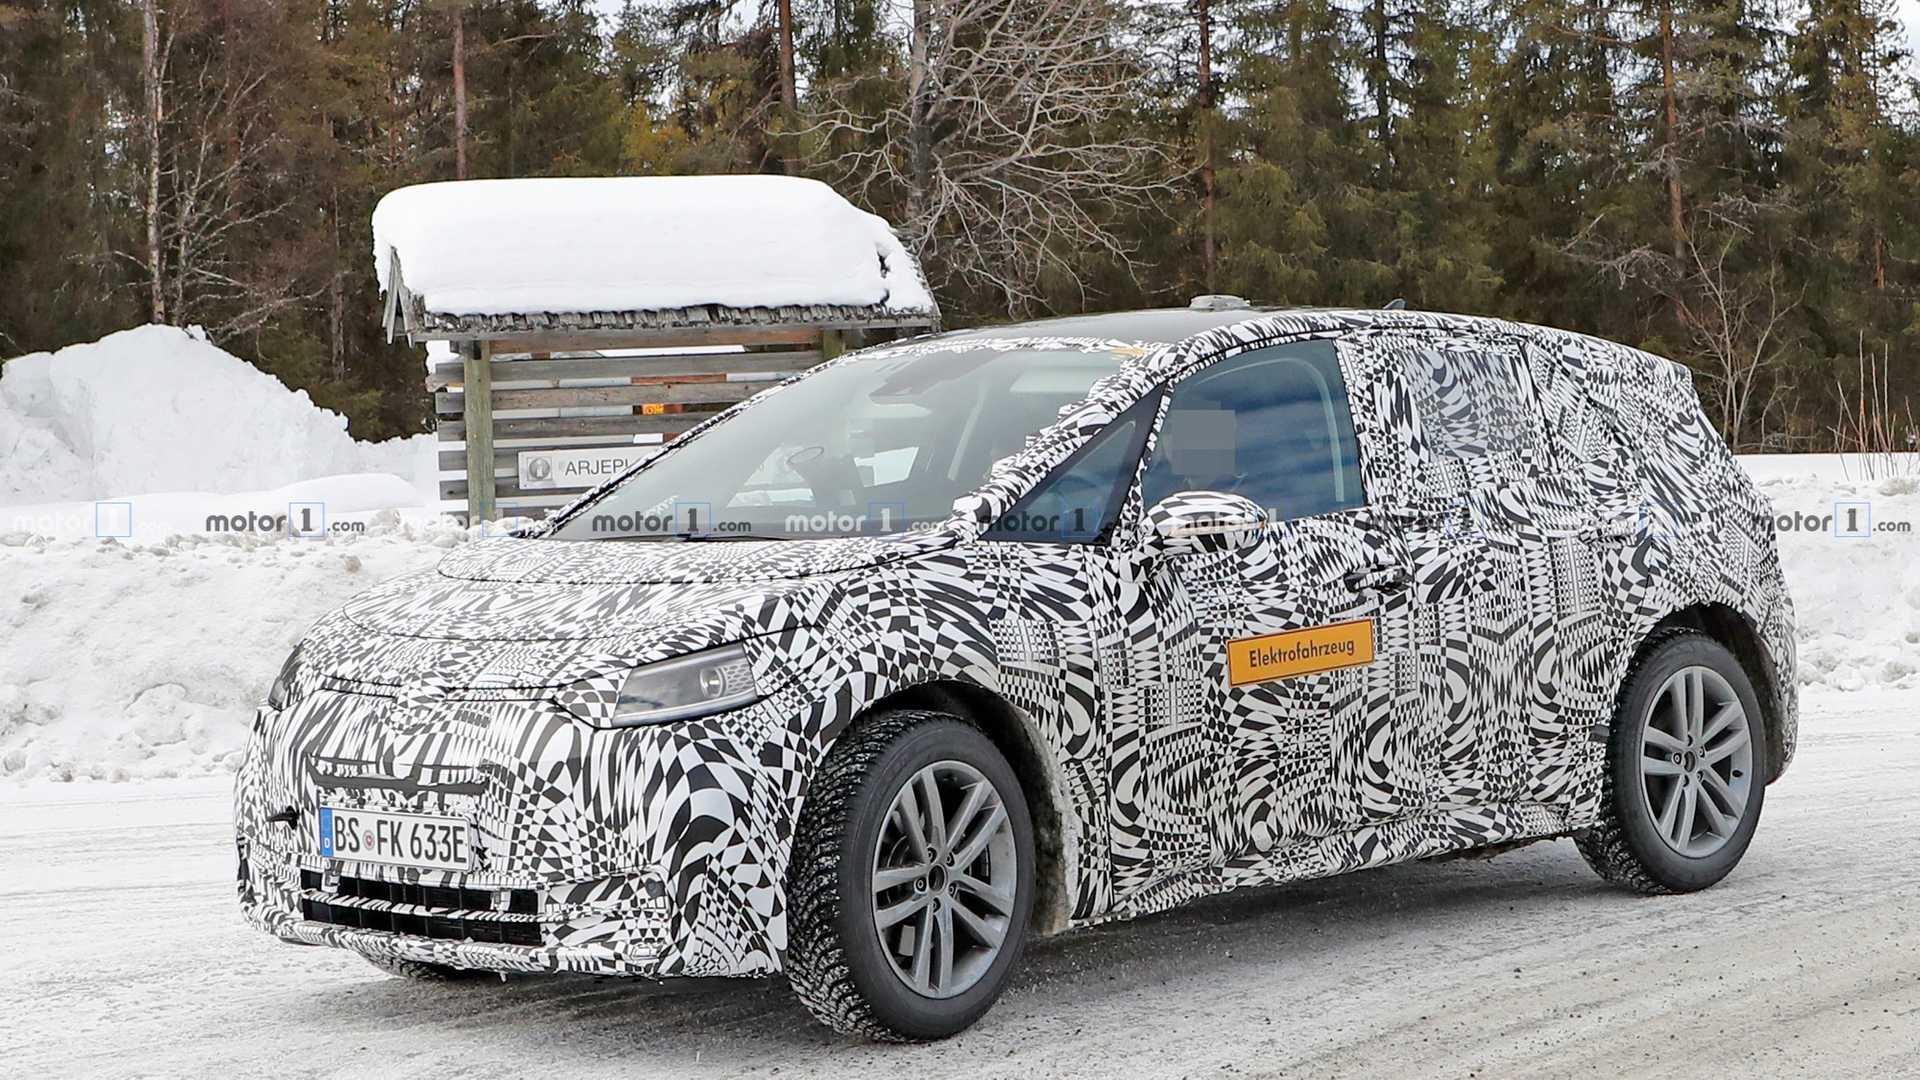 Volkswagen тестирует электрохэтч I.D. в снегу 1